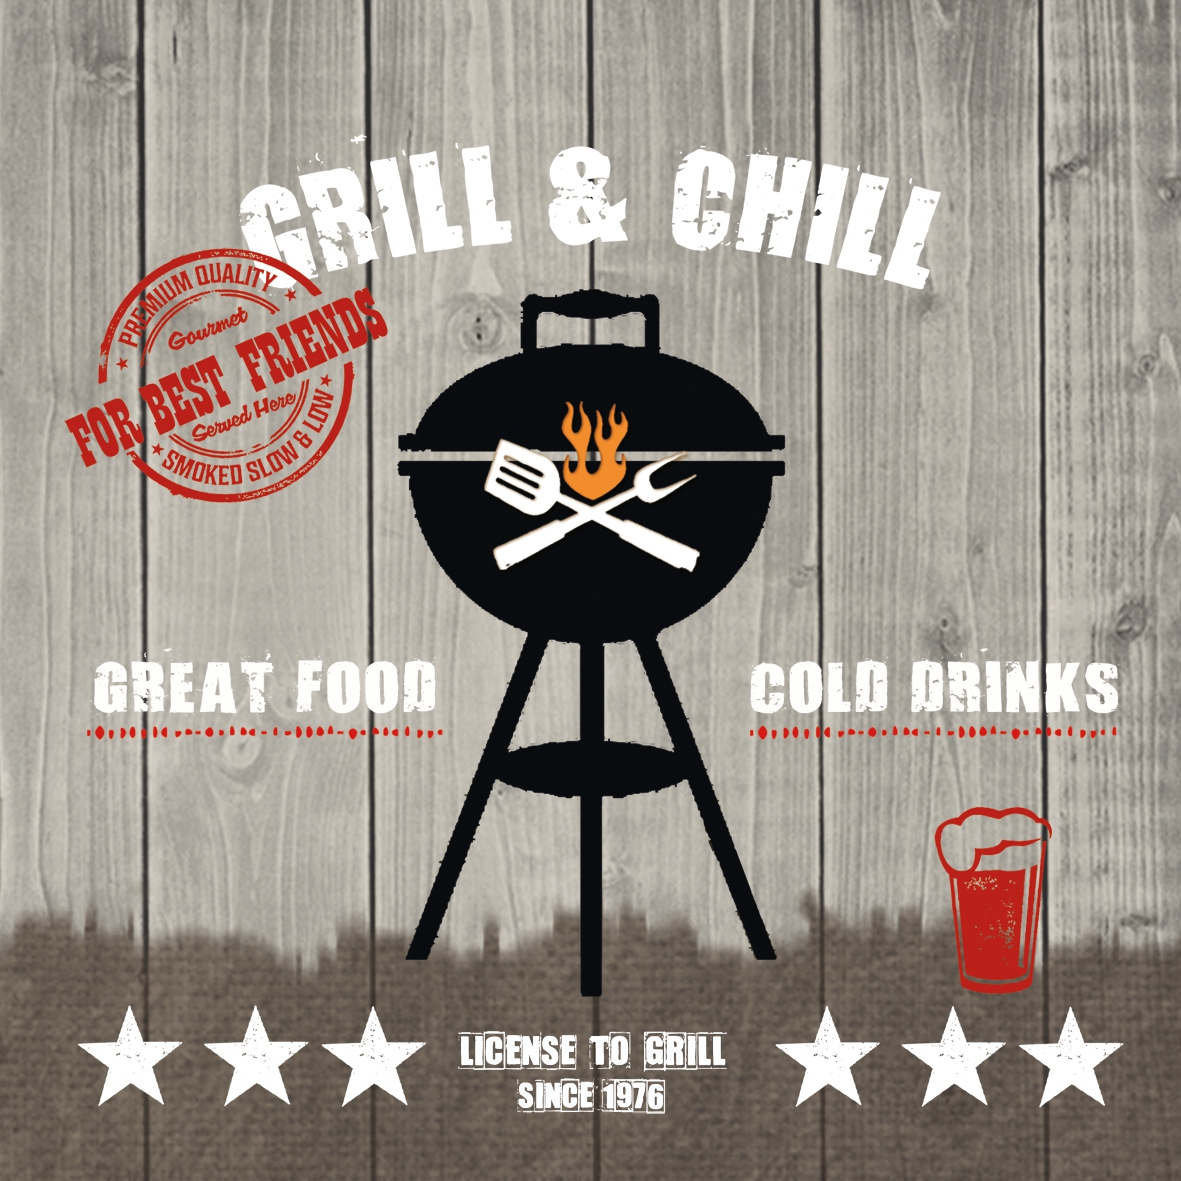 Lunch Servietten Grill & Chill wood